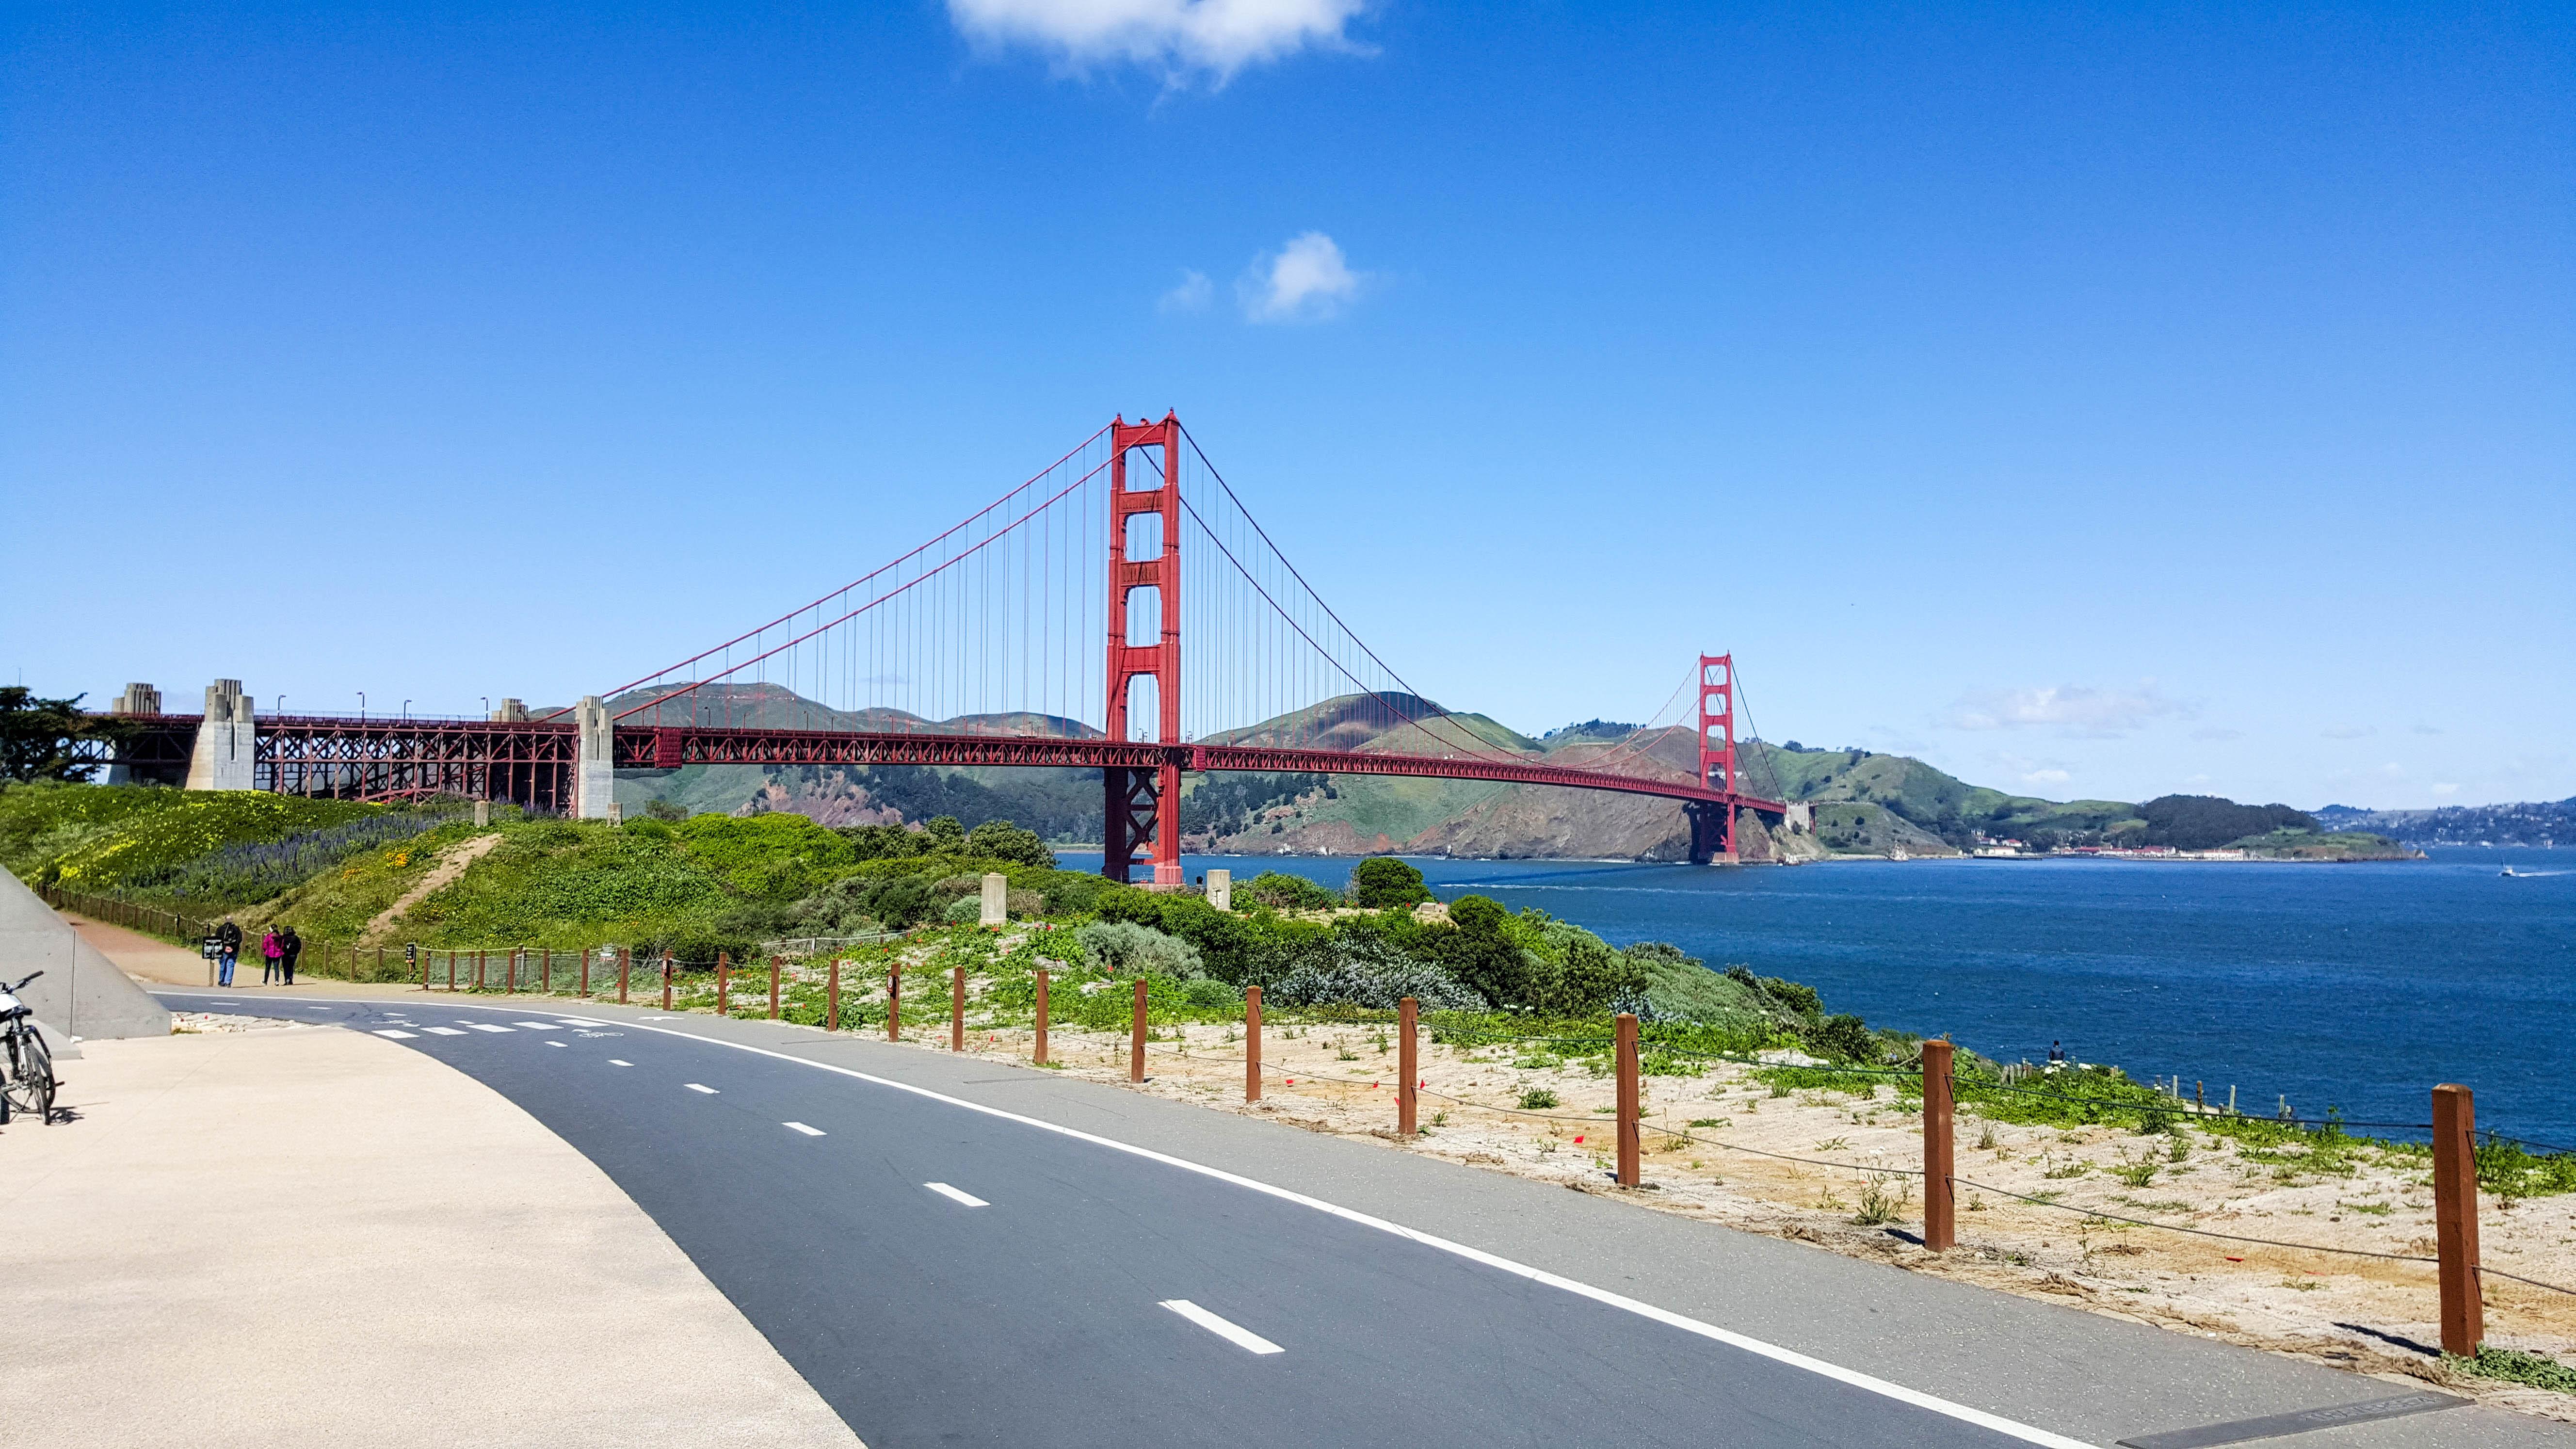 Golden Gate Bridge Sausalito Amp Tiburon By Bike Normal